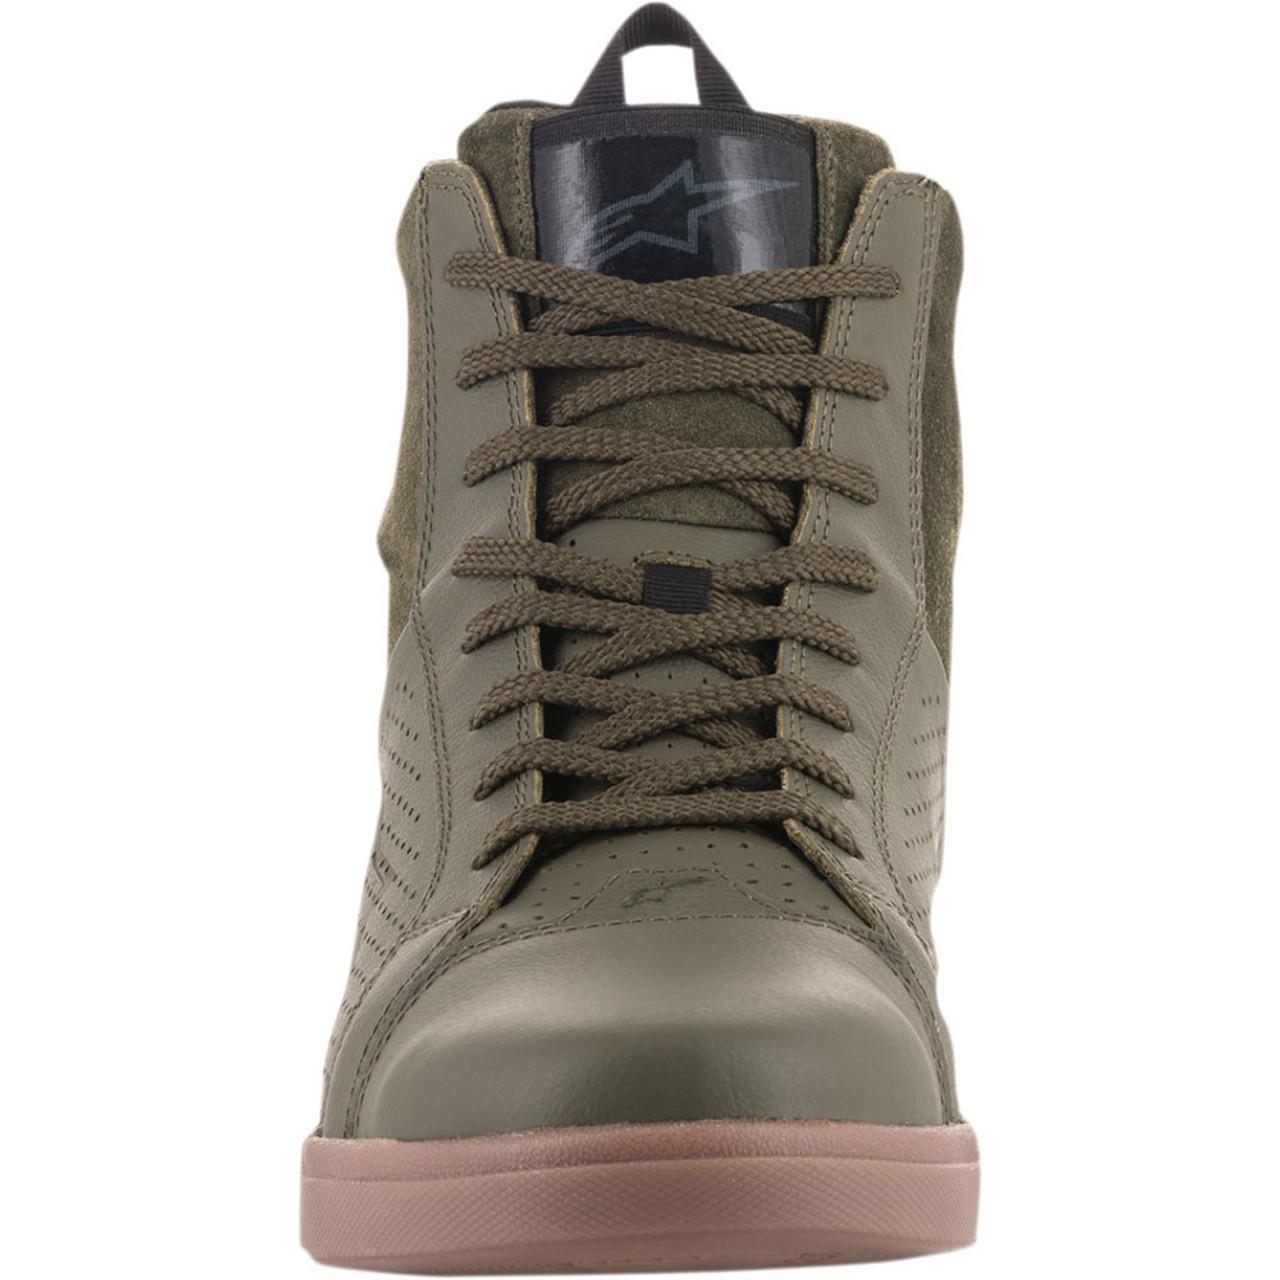 e1744a6073 ... Alpinestars Jam Air Shoes - Military Green ...